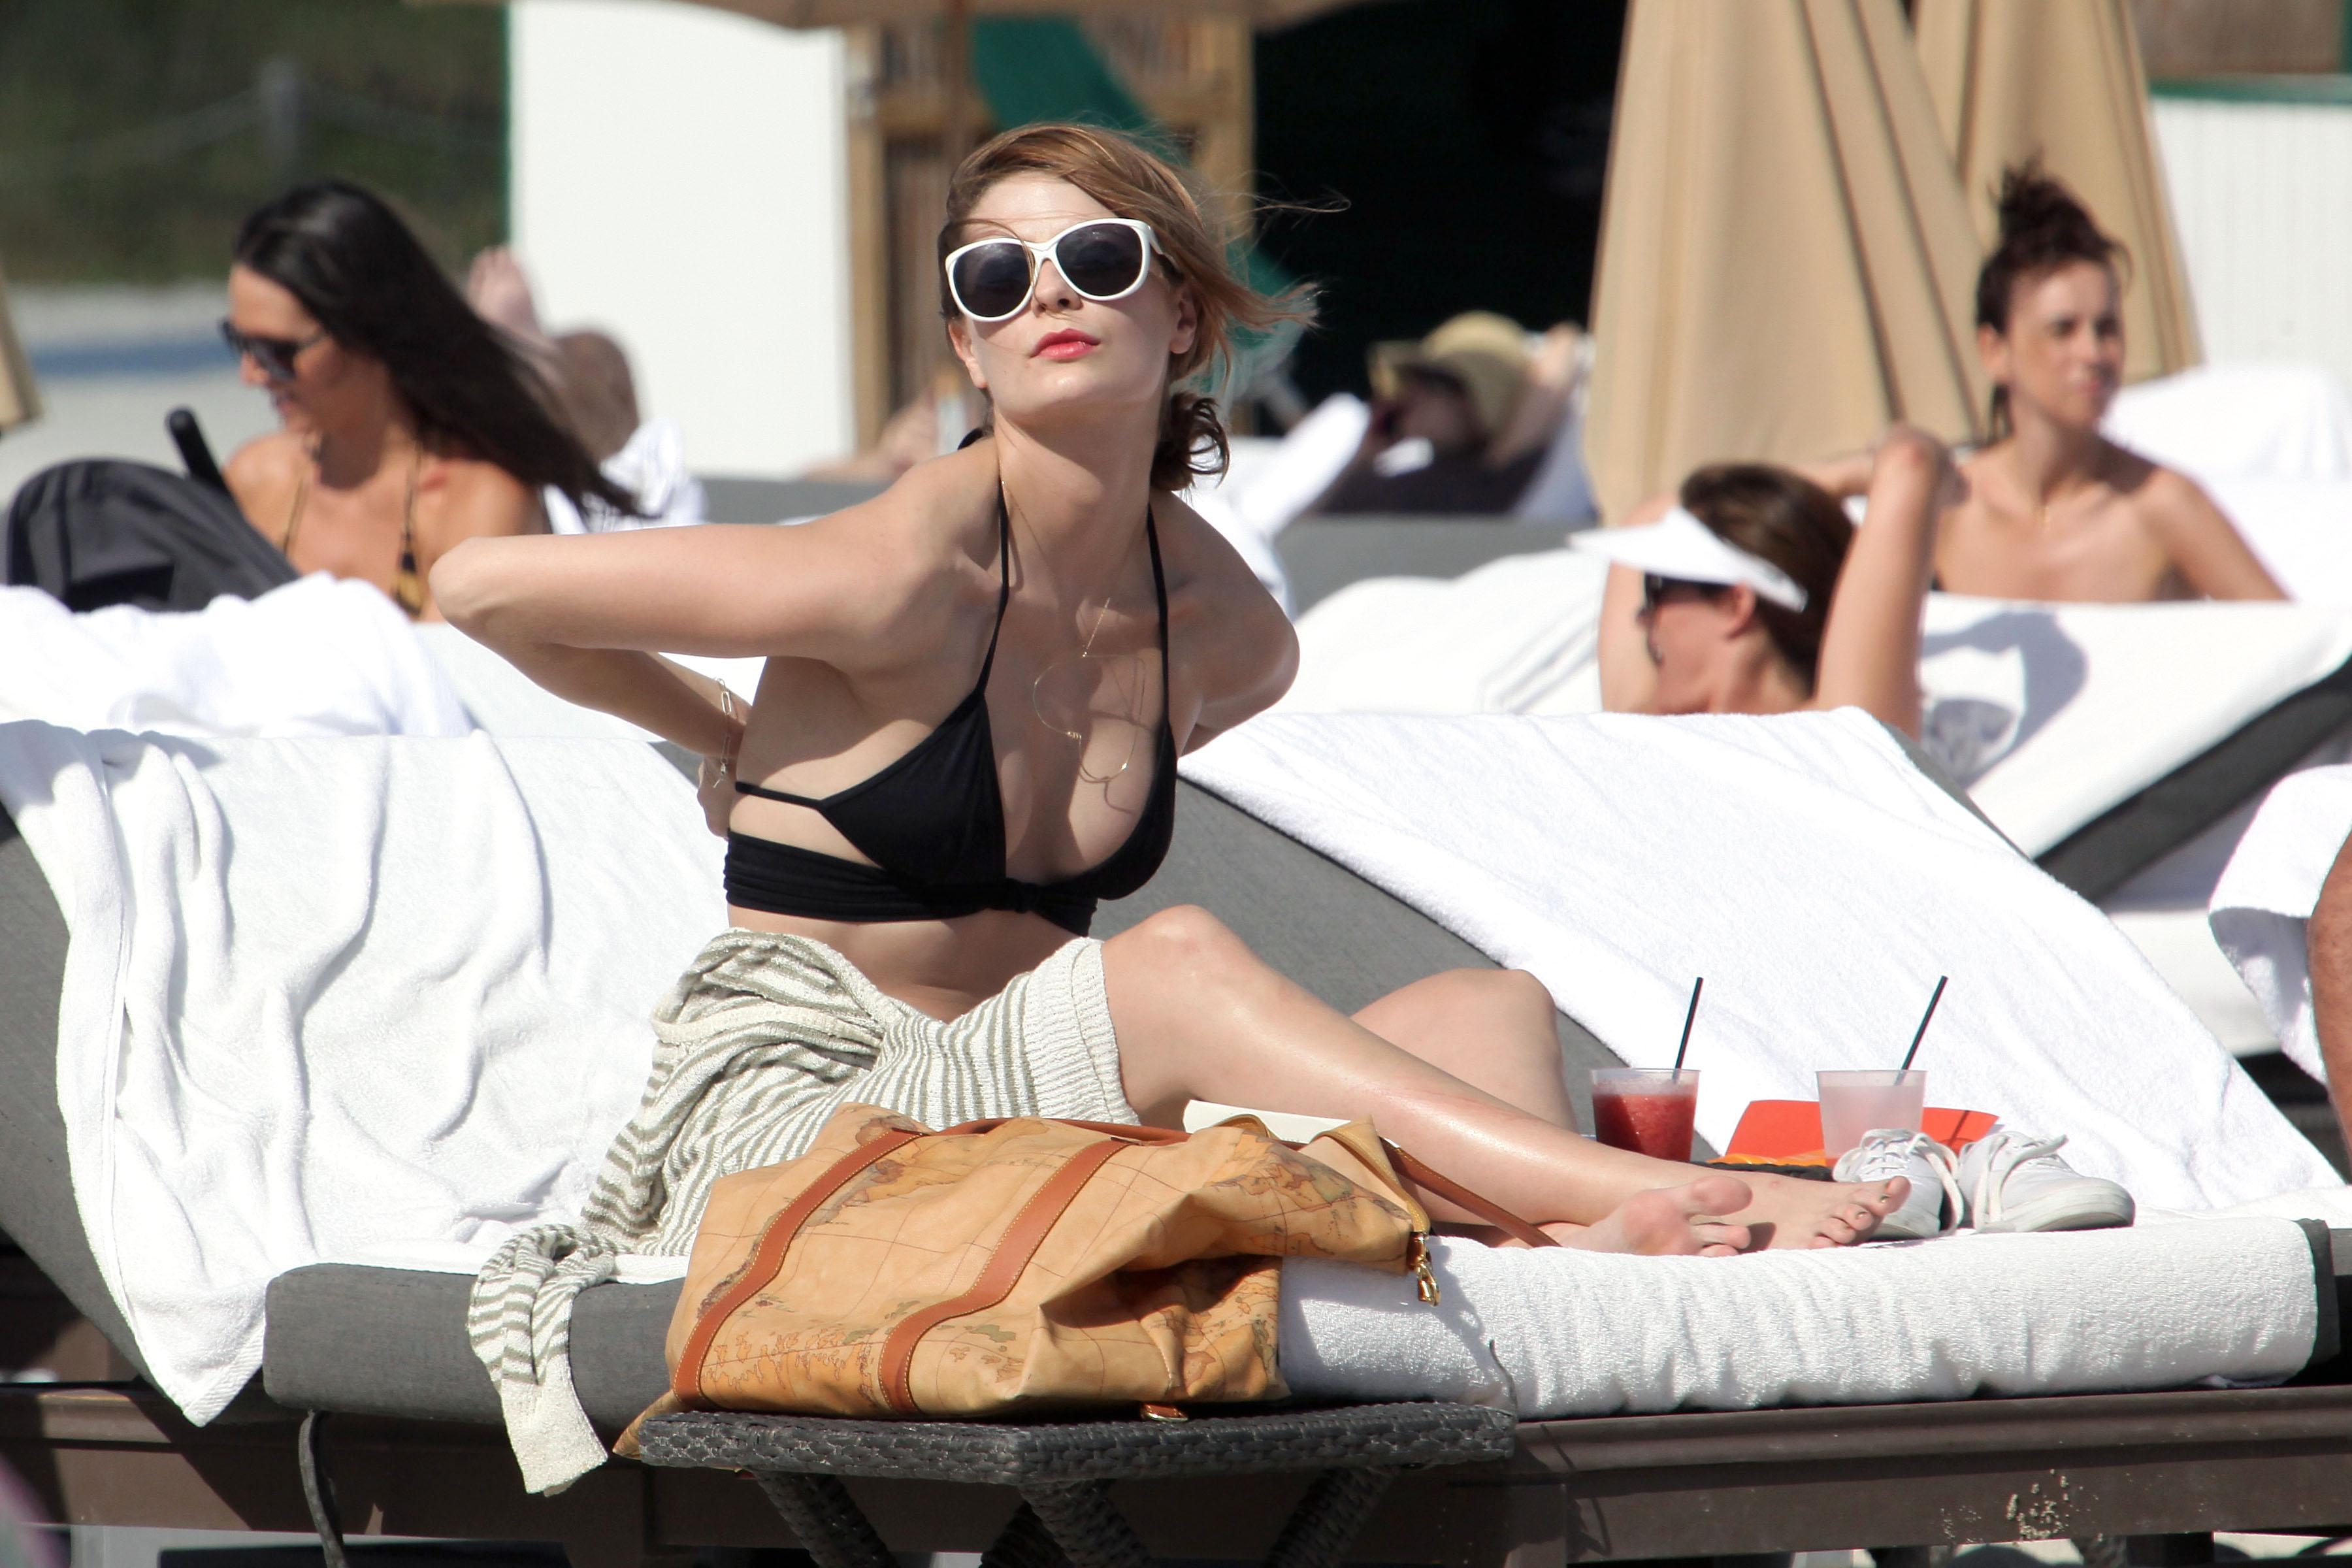 311906425_Mischa_Barton_Bikini_Candids_on_the_Beach_in_Miami_December_27_2011_133_122_238lo.jpg